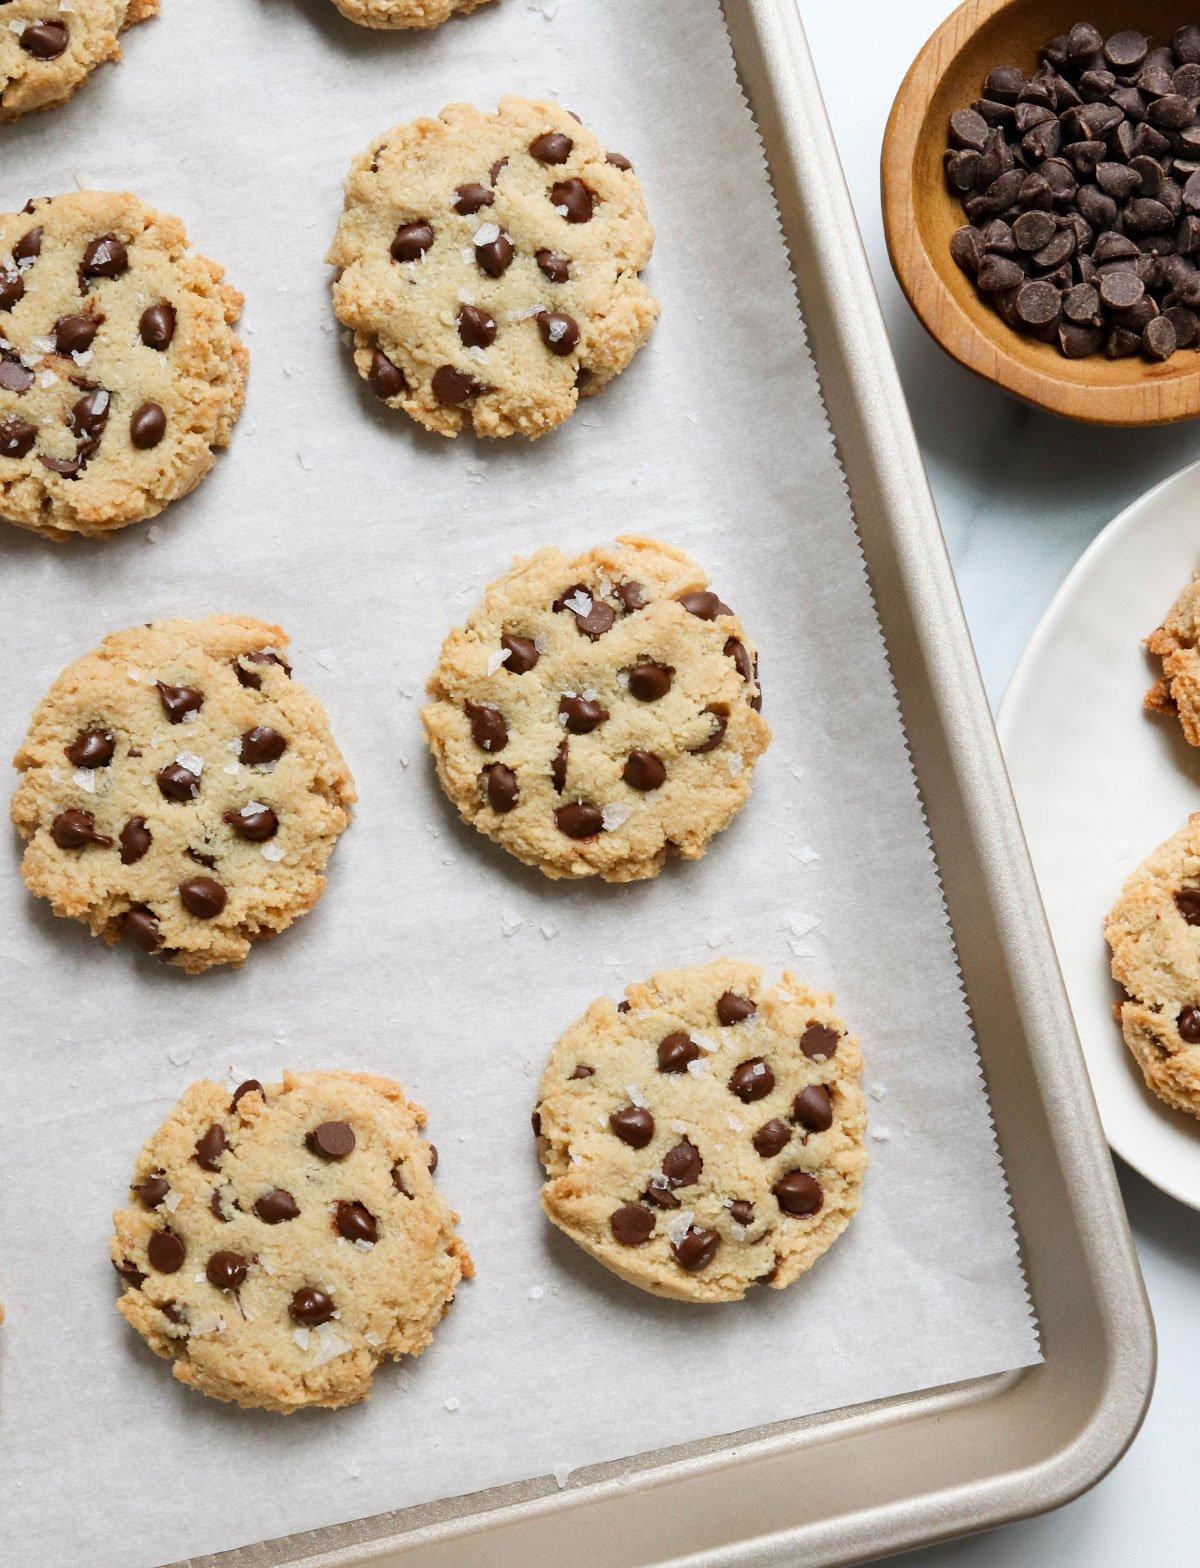 vegan almond flour cookies baked on pan